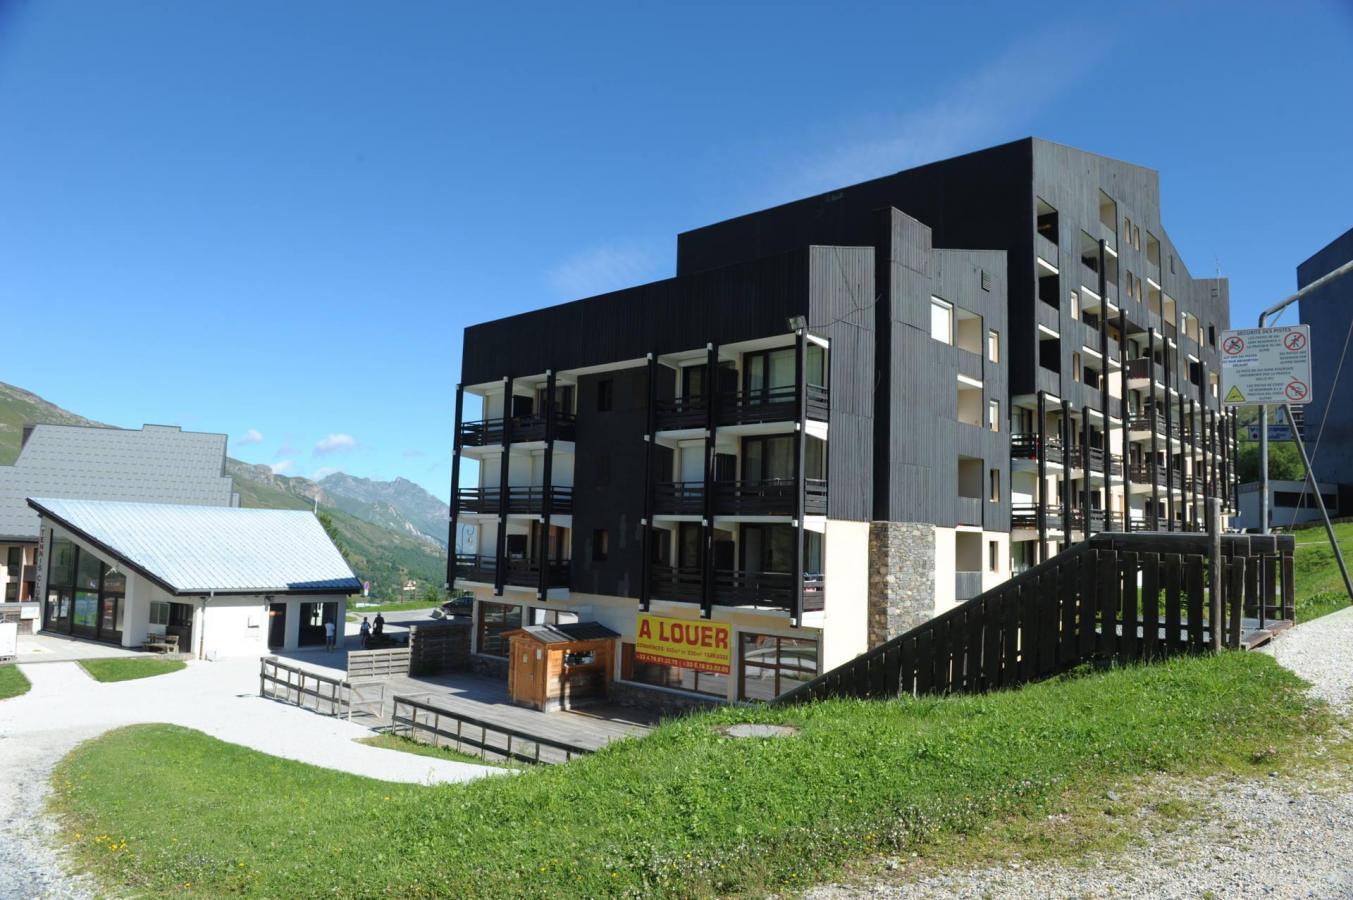 Location au ski Residence Villaret - Les Menuires